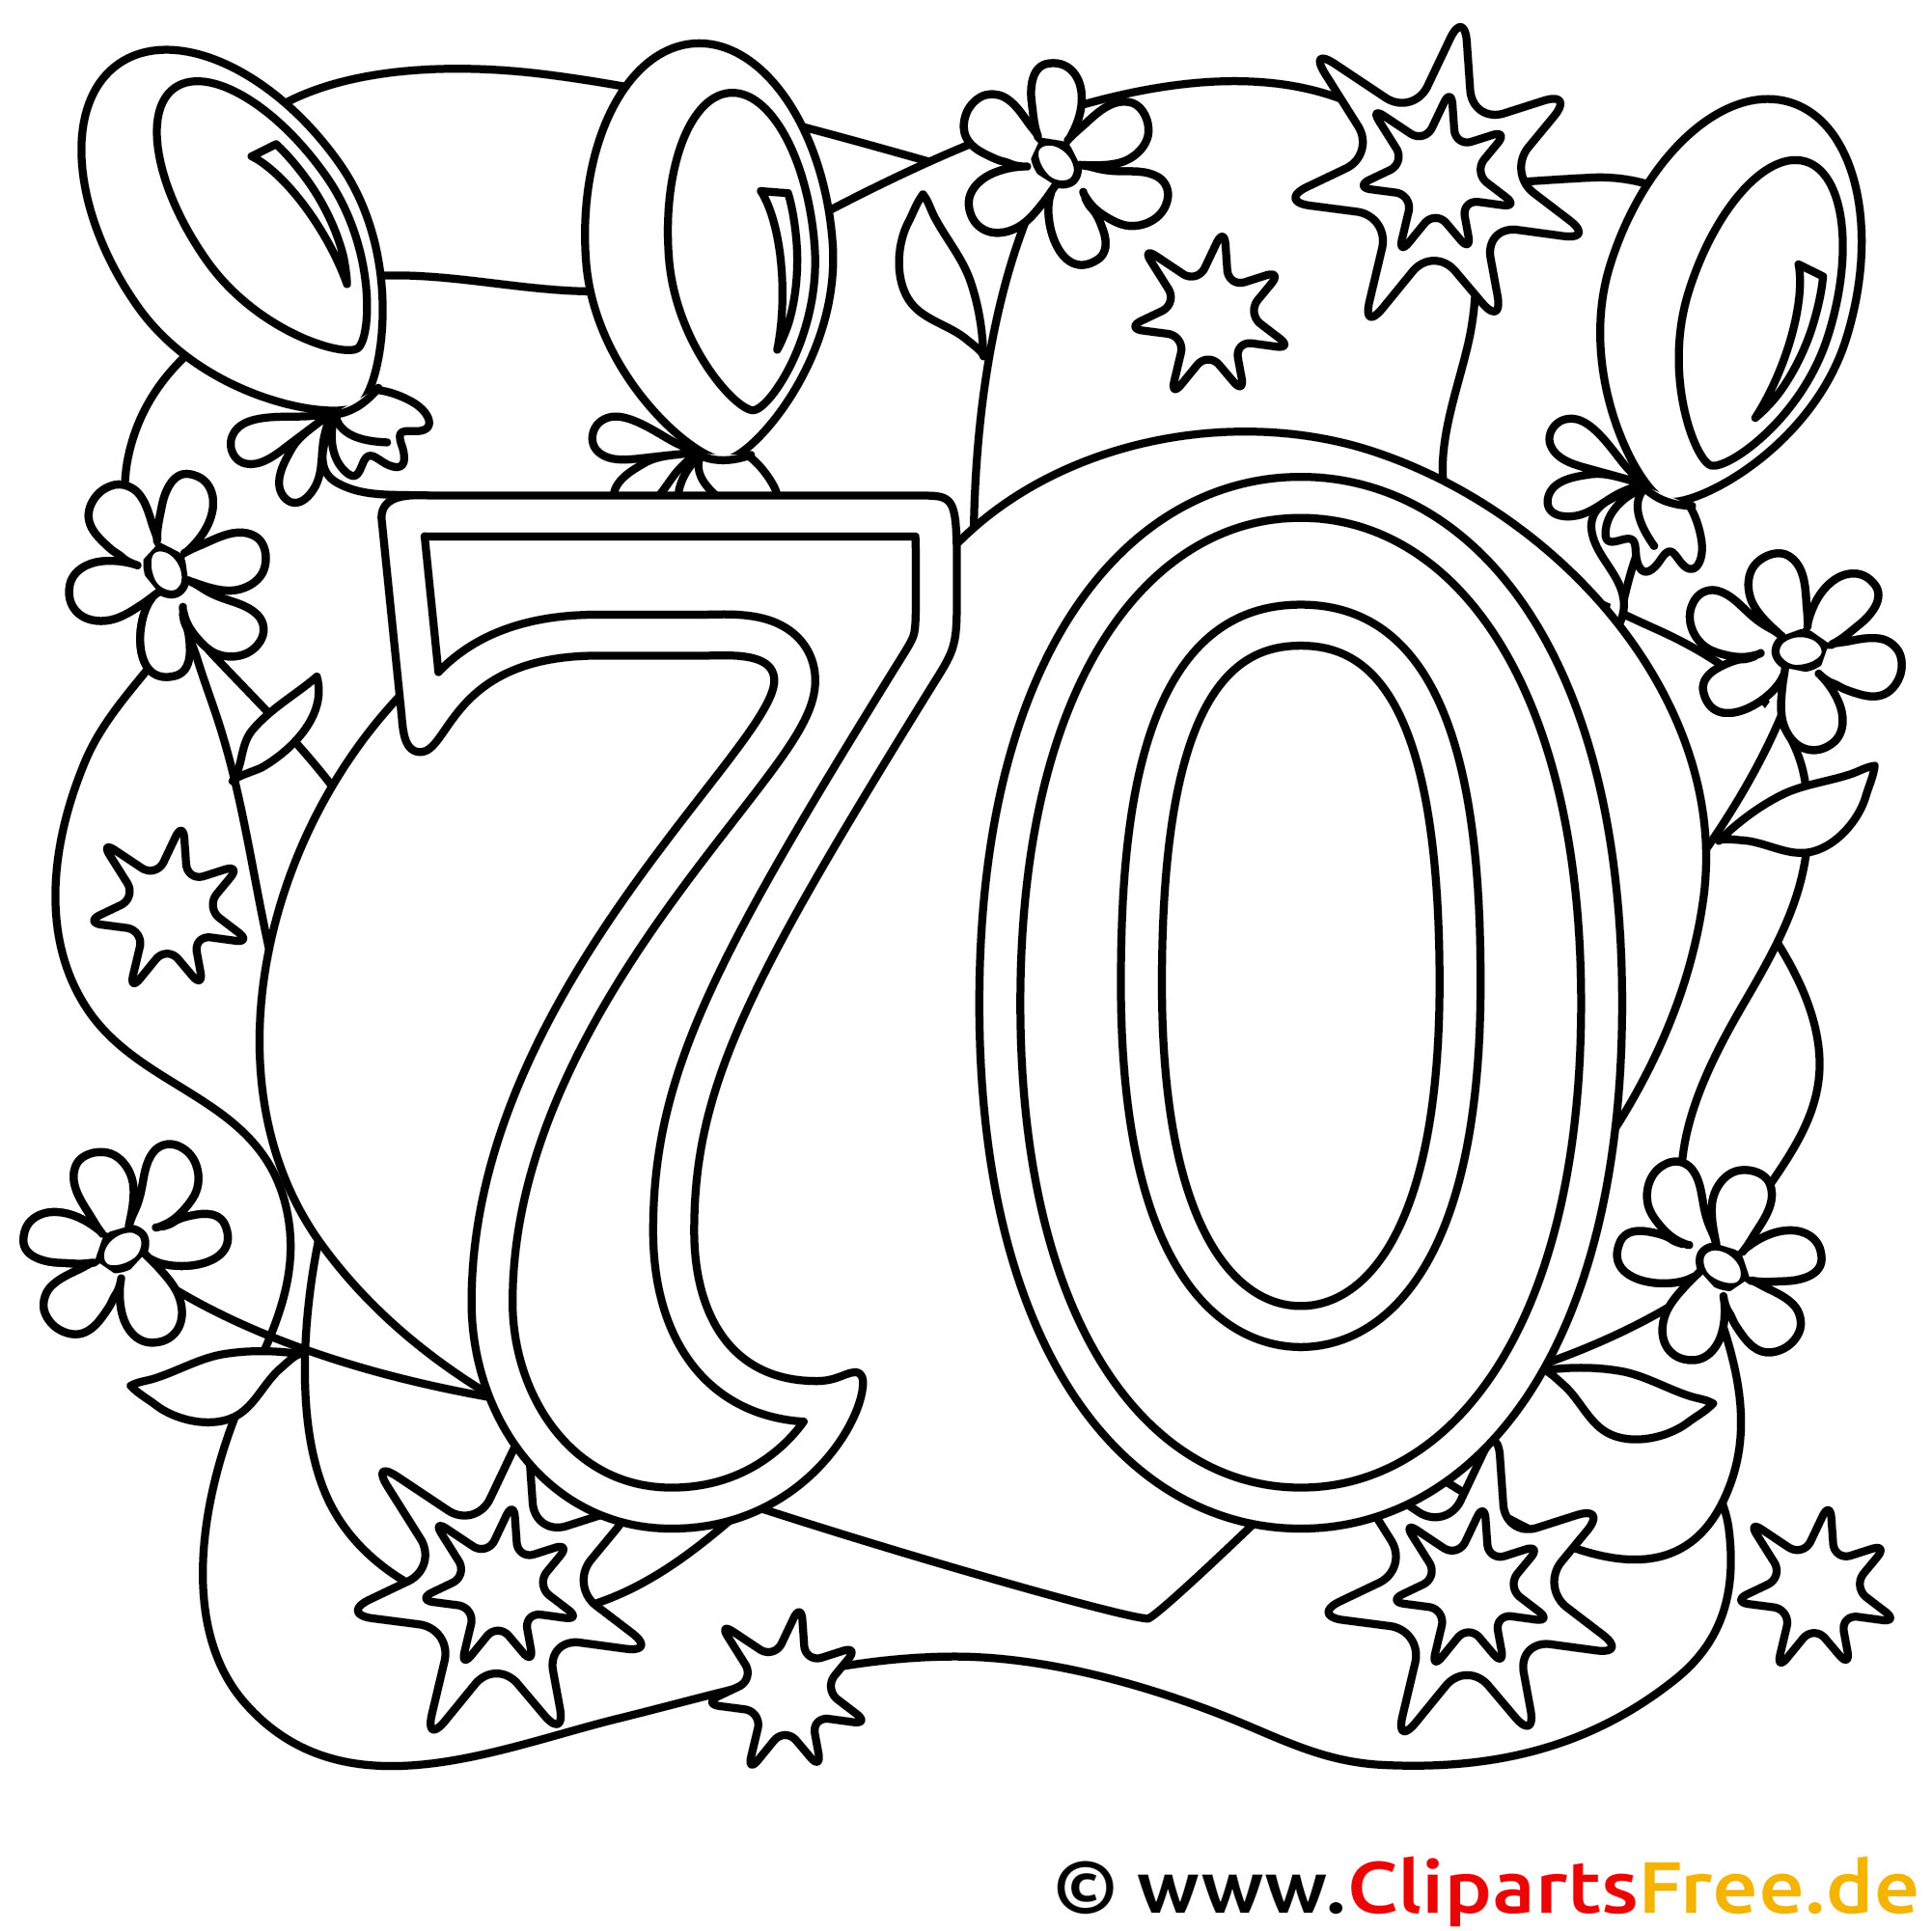 Ausmalbild zum 70 Geburtstag